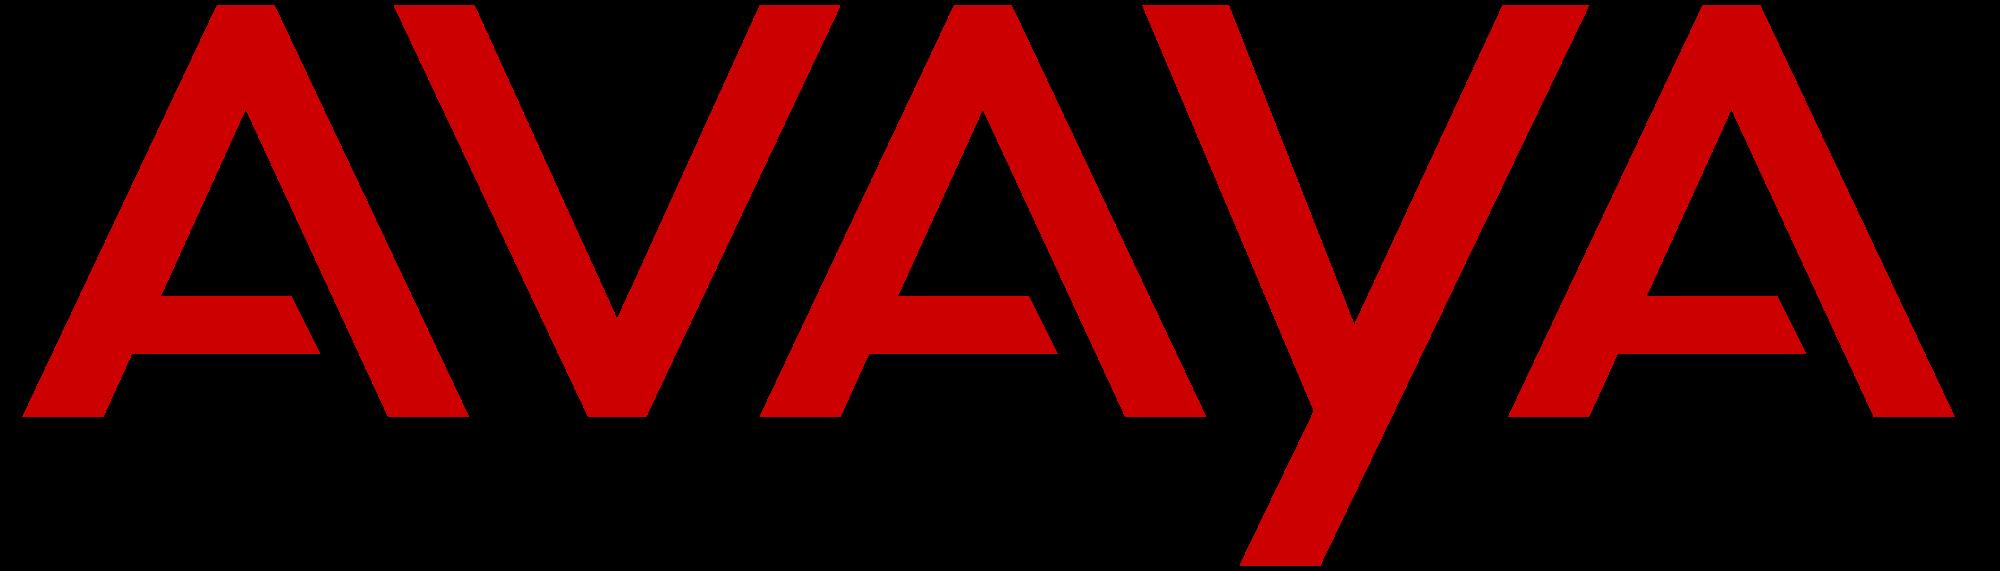 Avaya 1